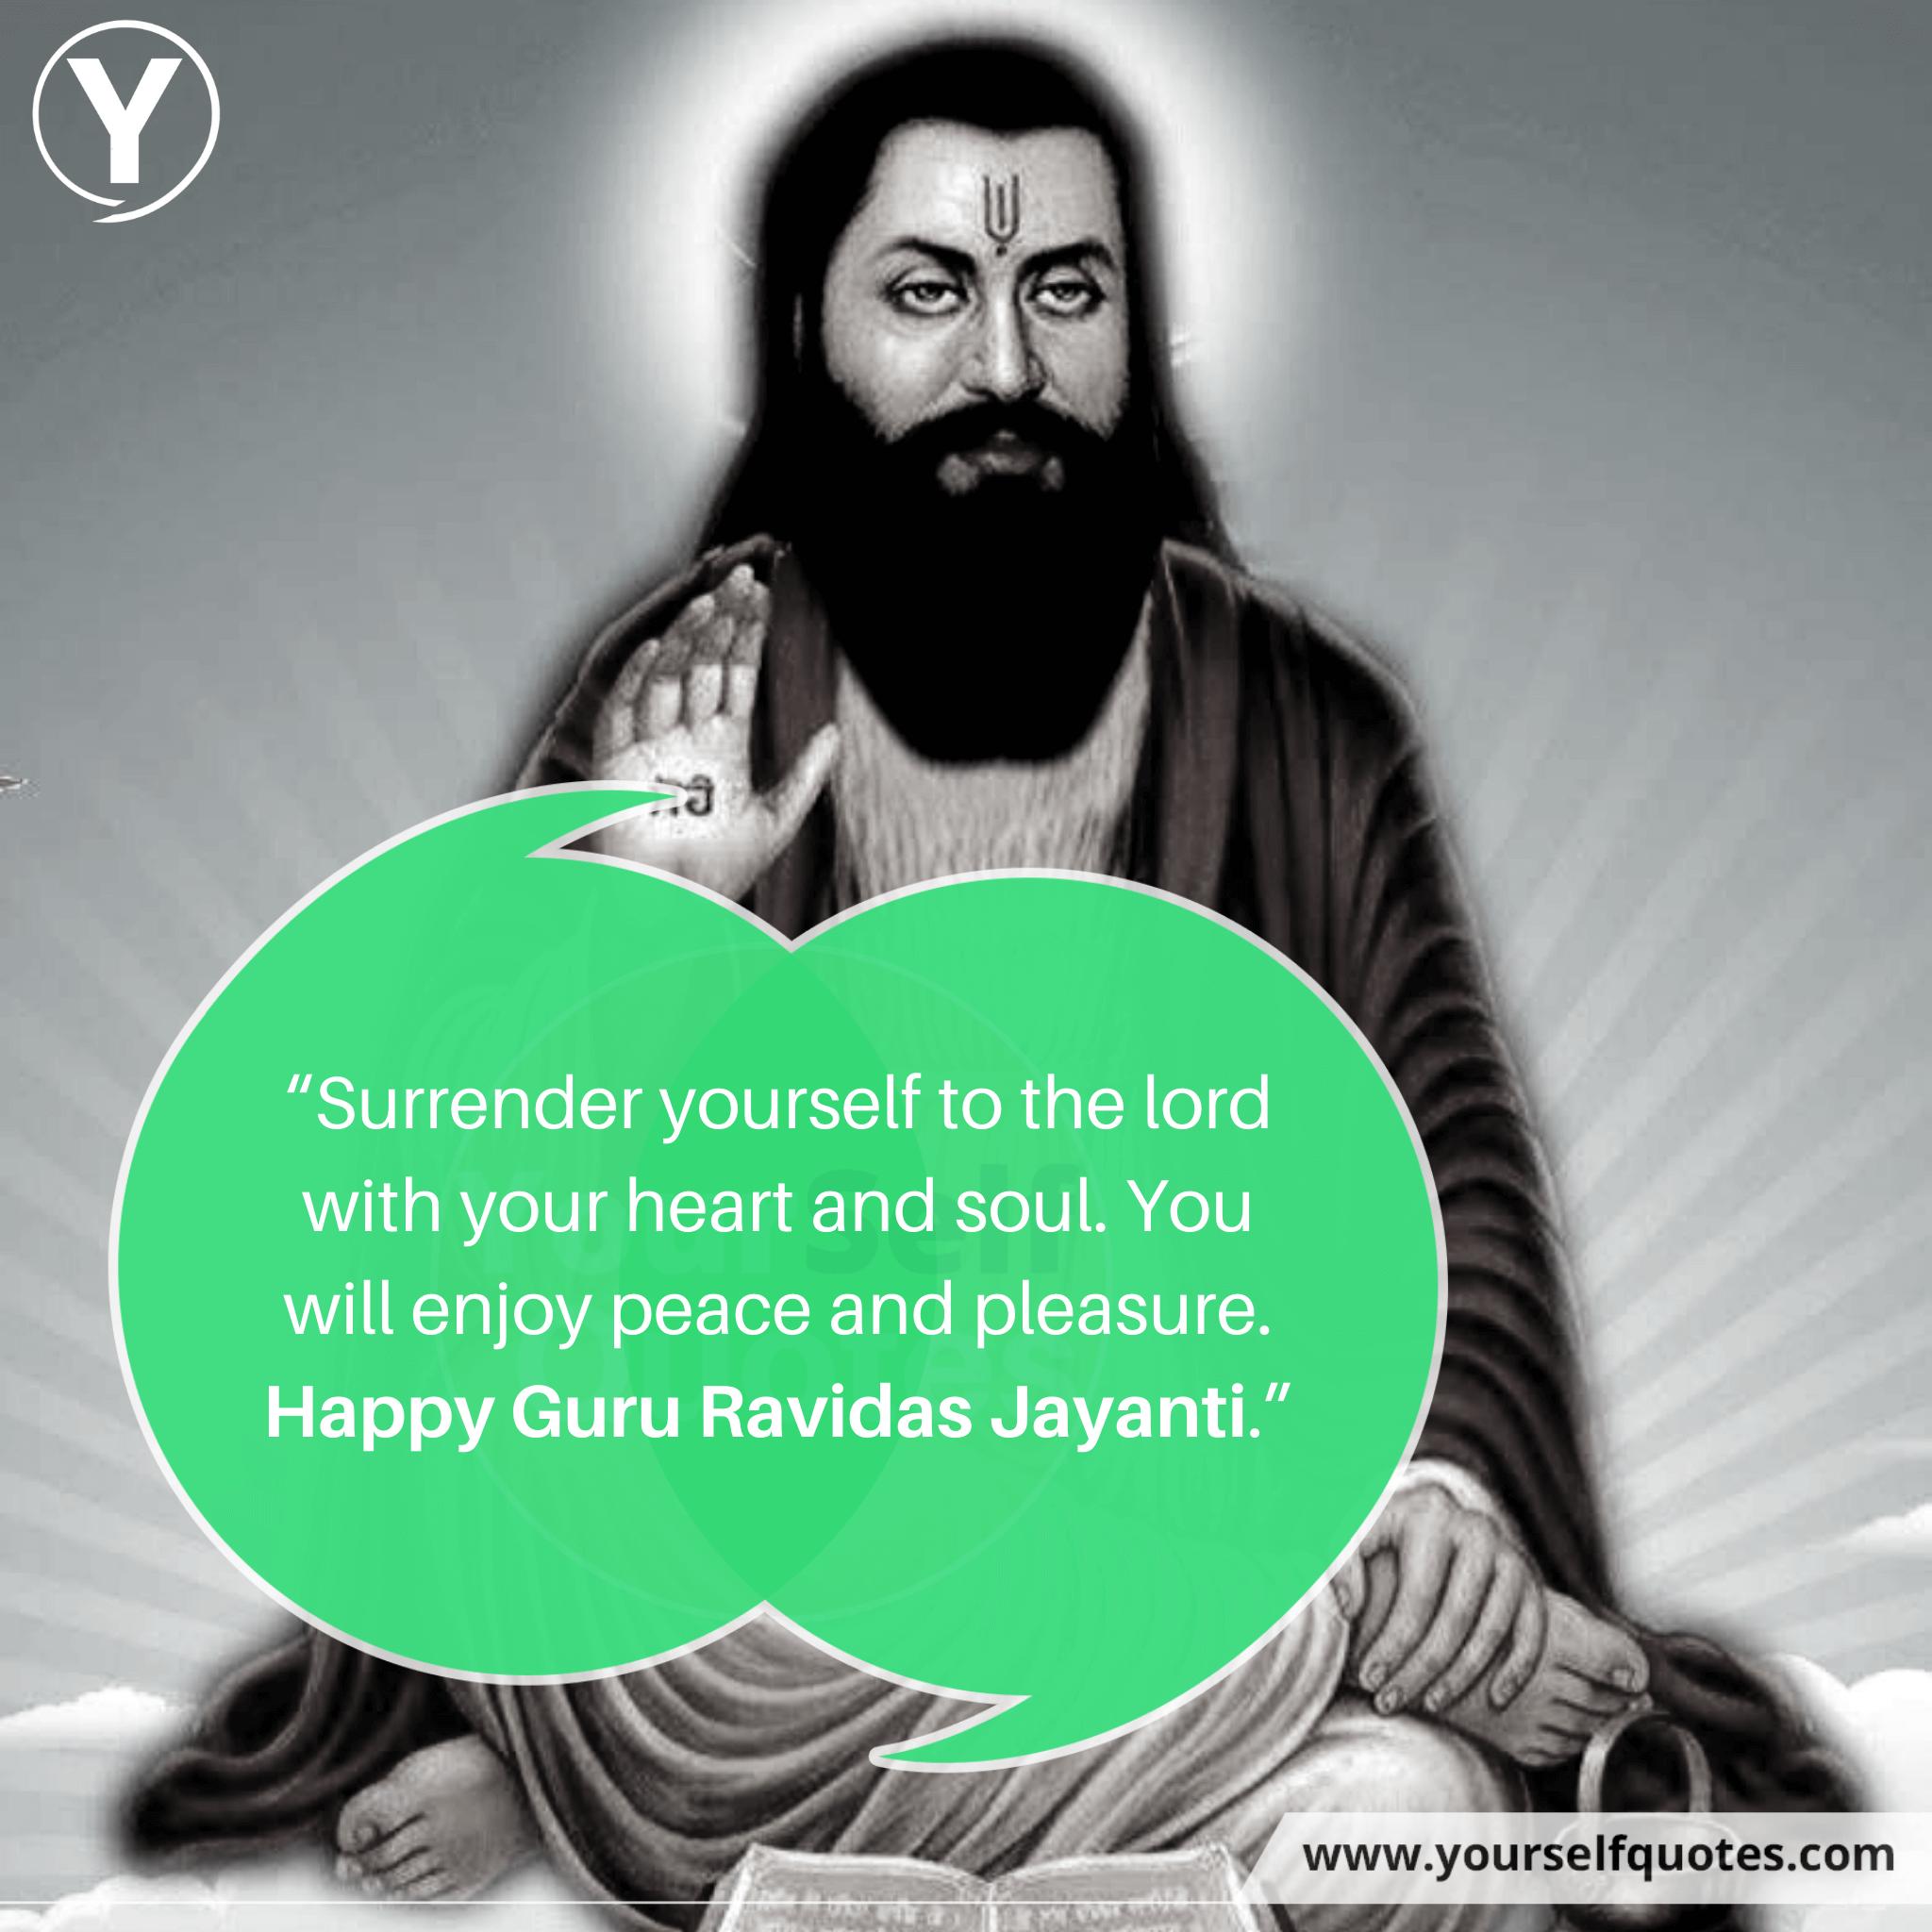 Guru Ravidas Jayanti Wishes